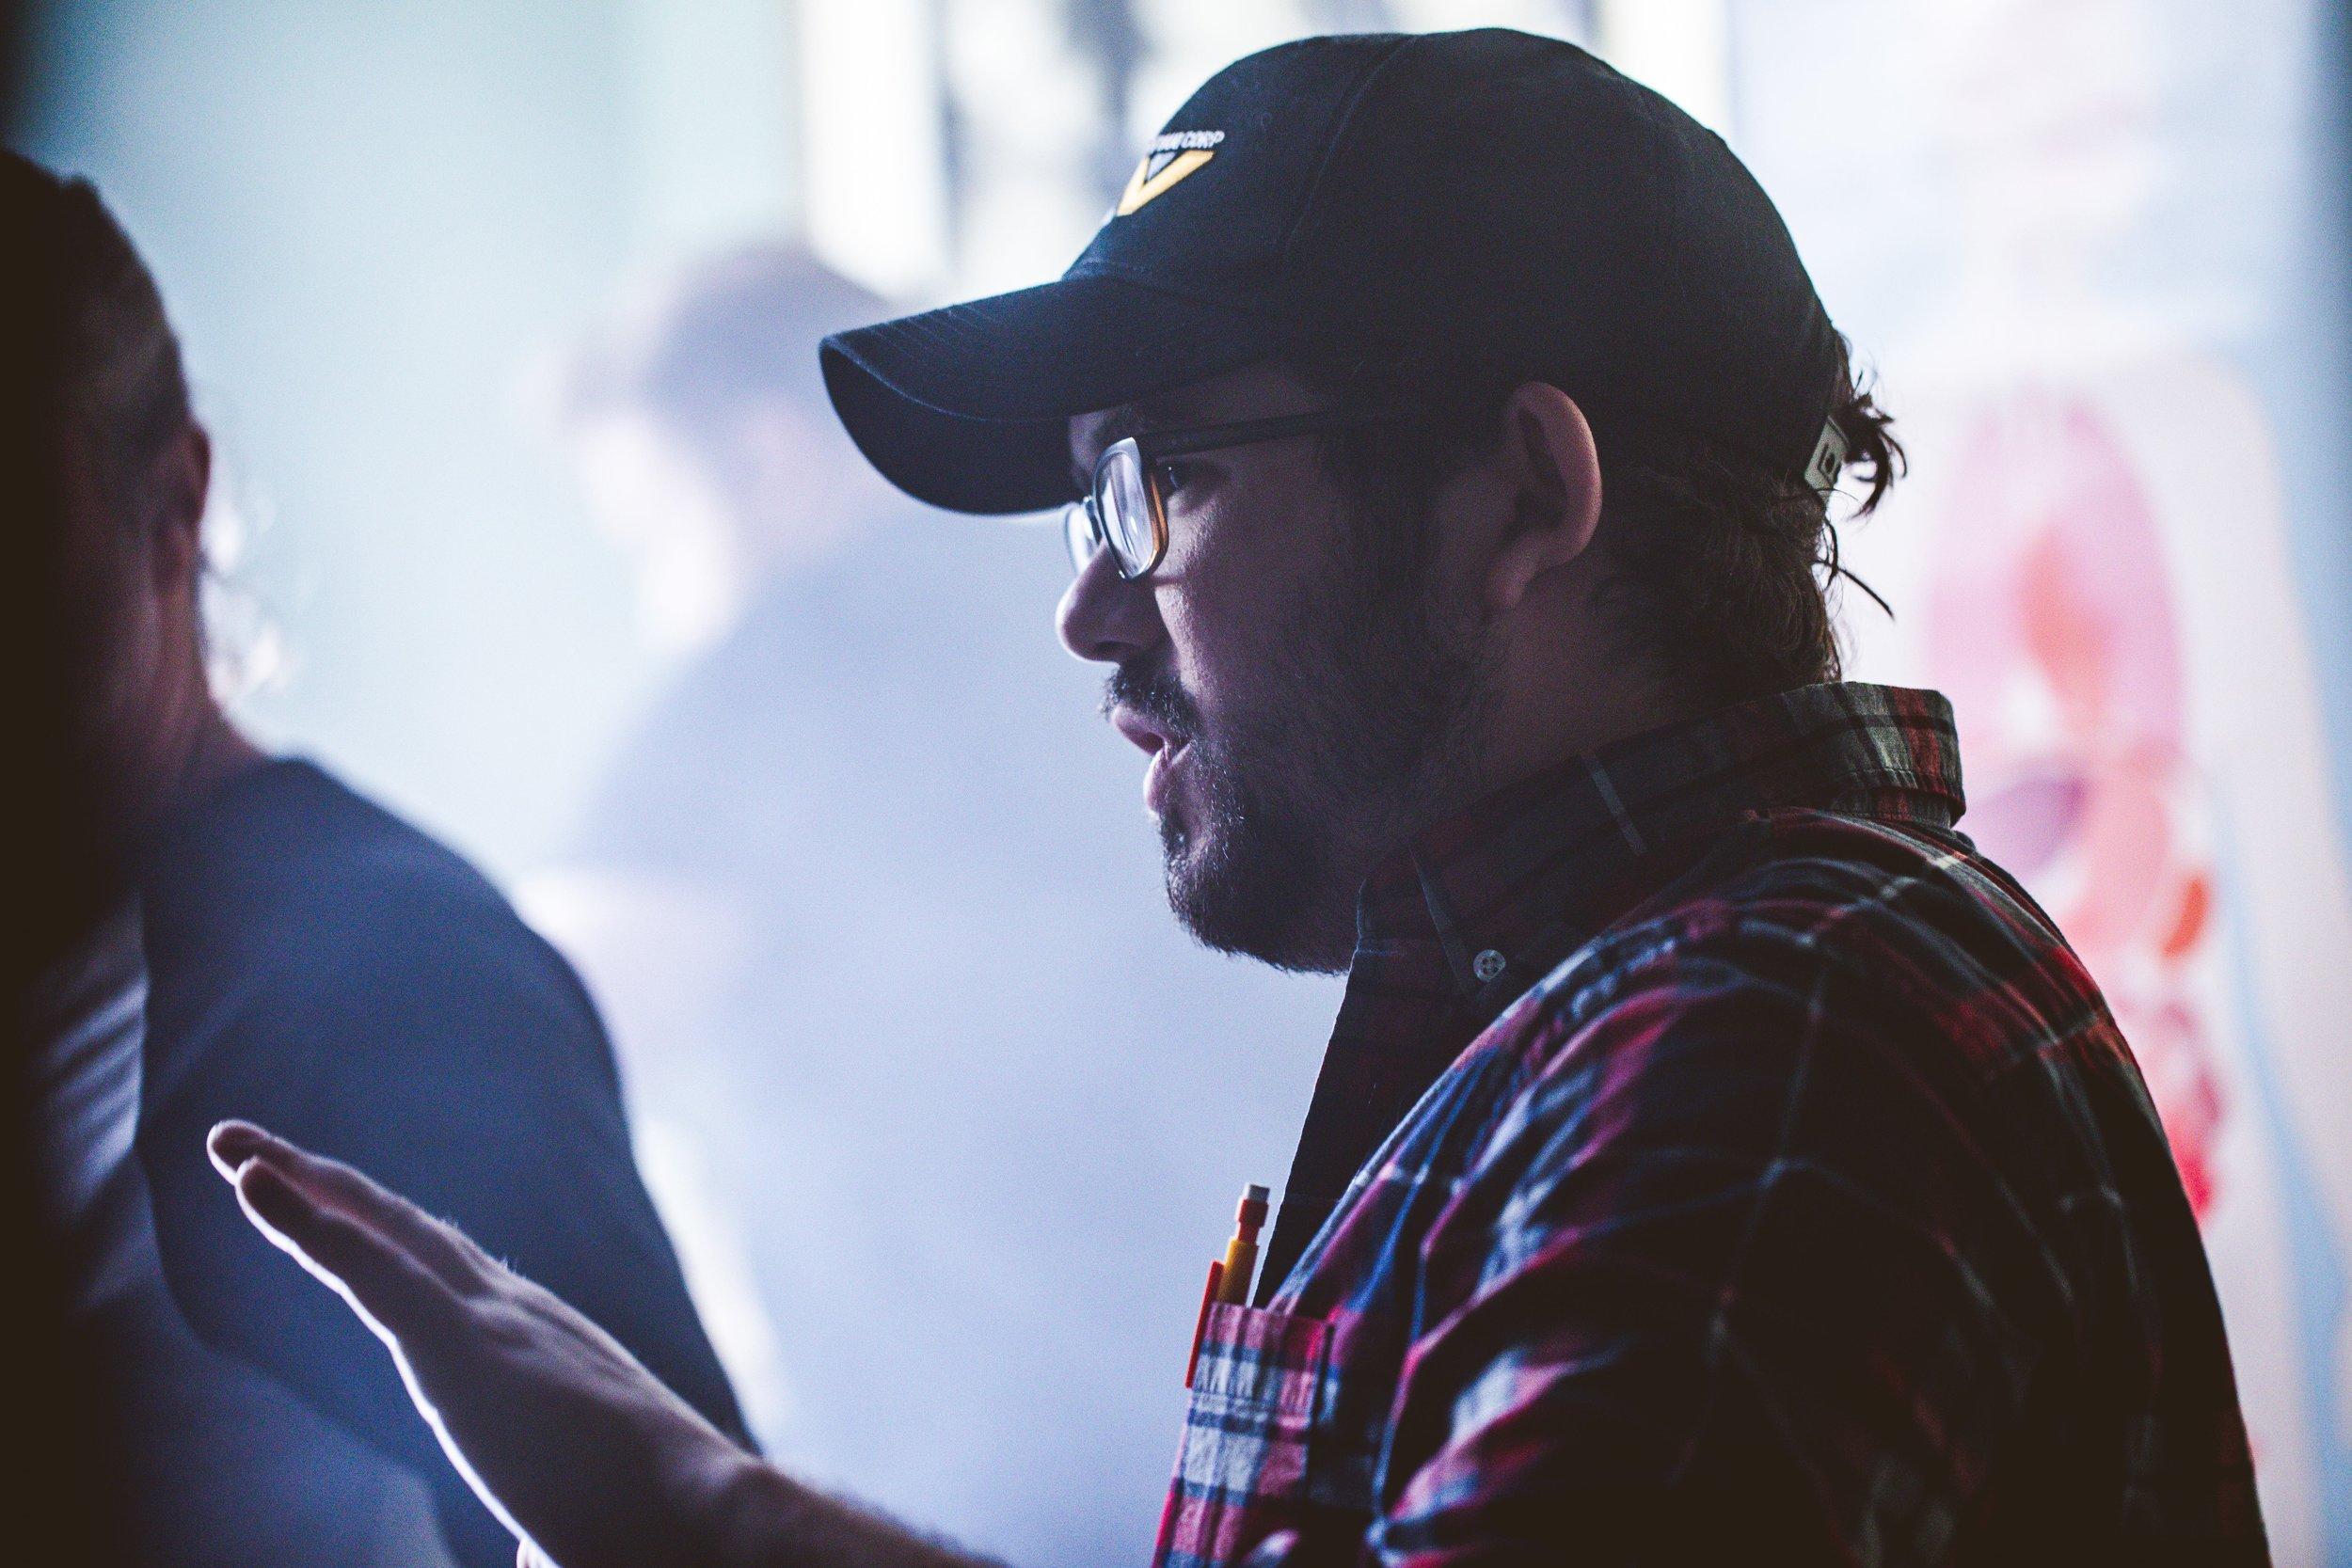 daniel fabelo - writer/director